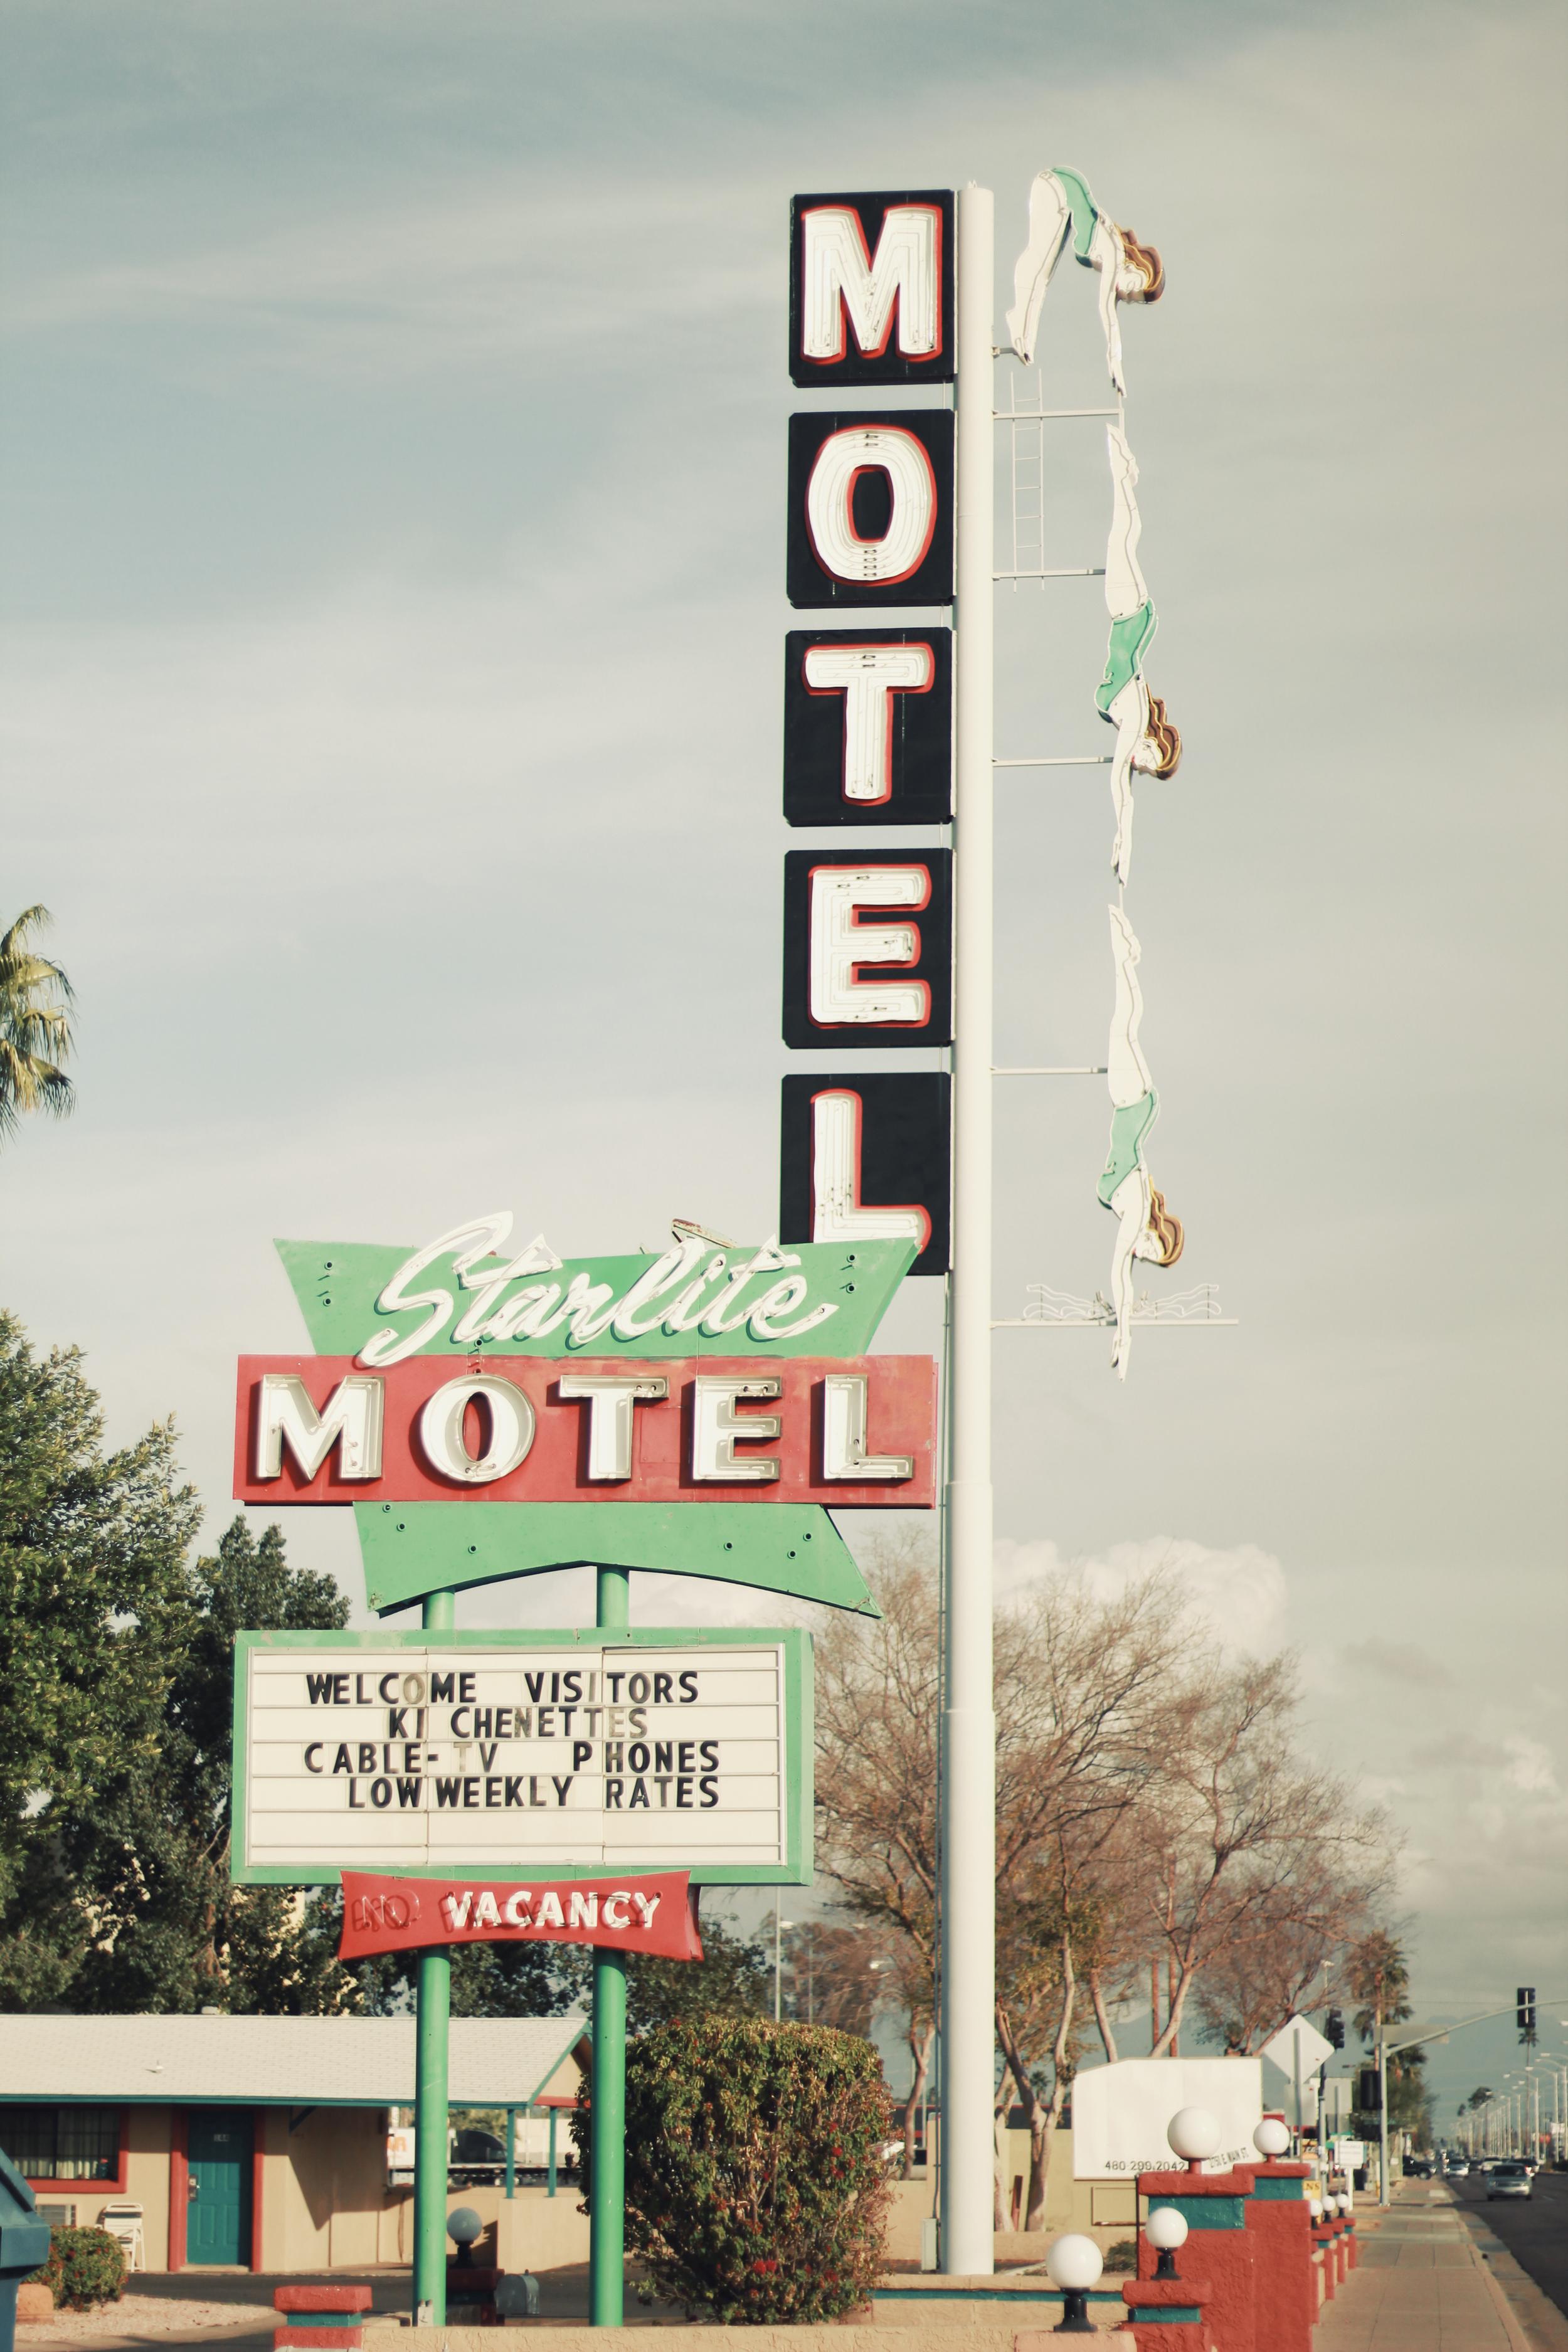 Starlite Motel.jpg